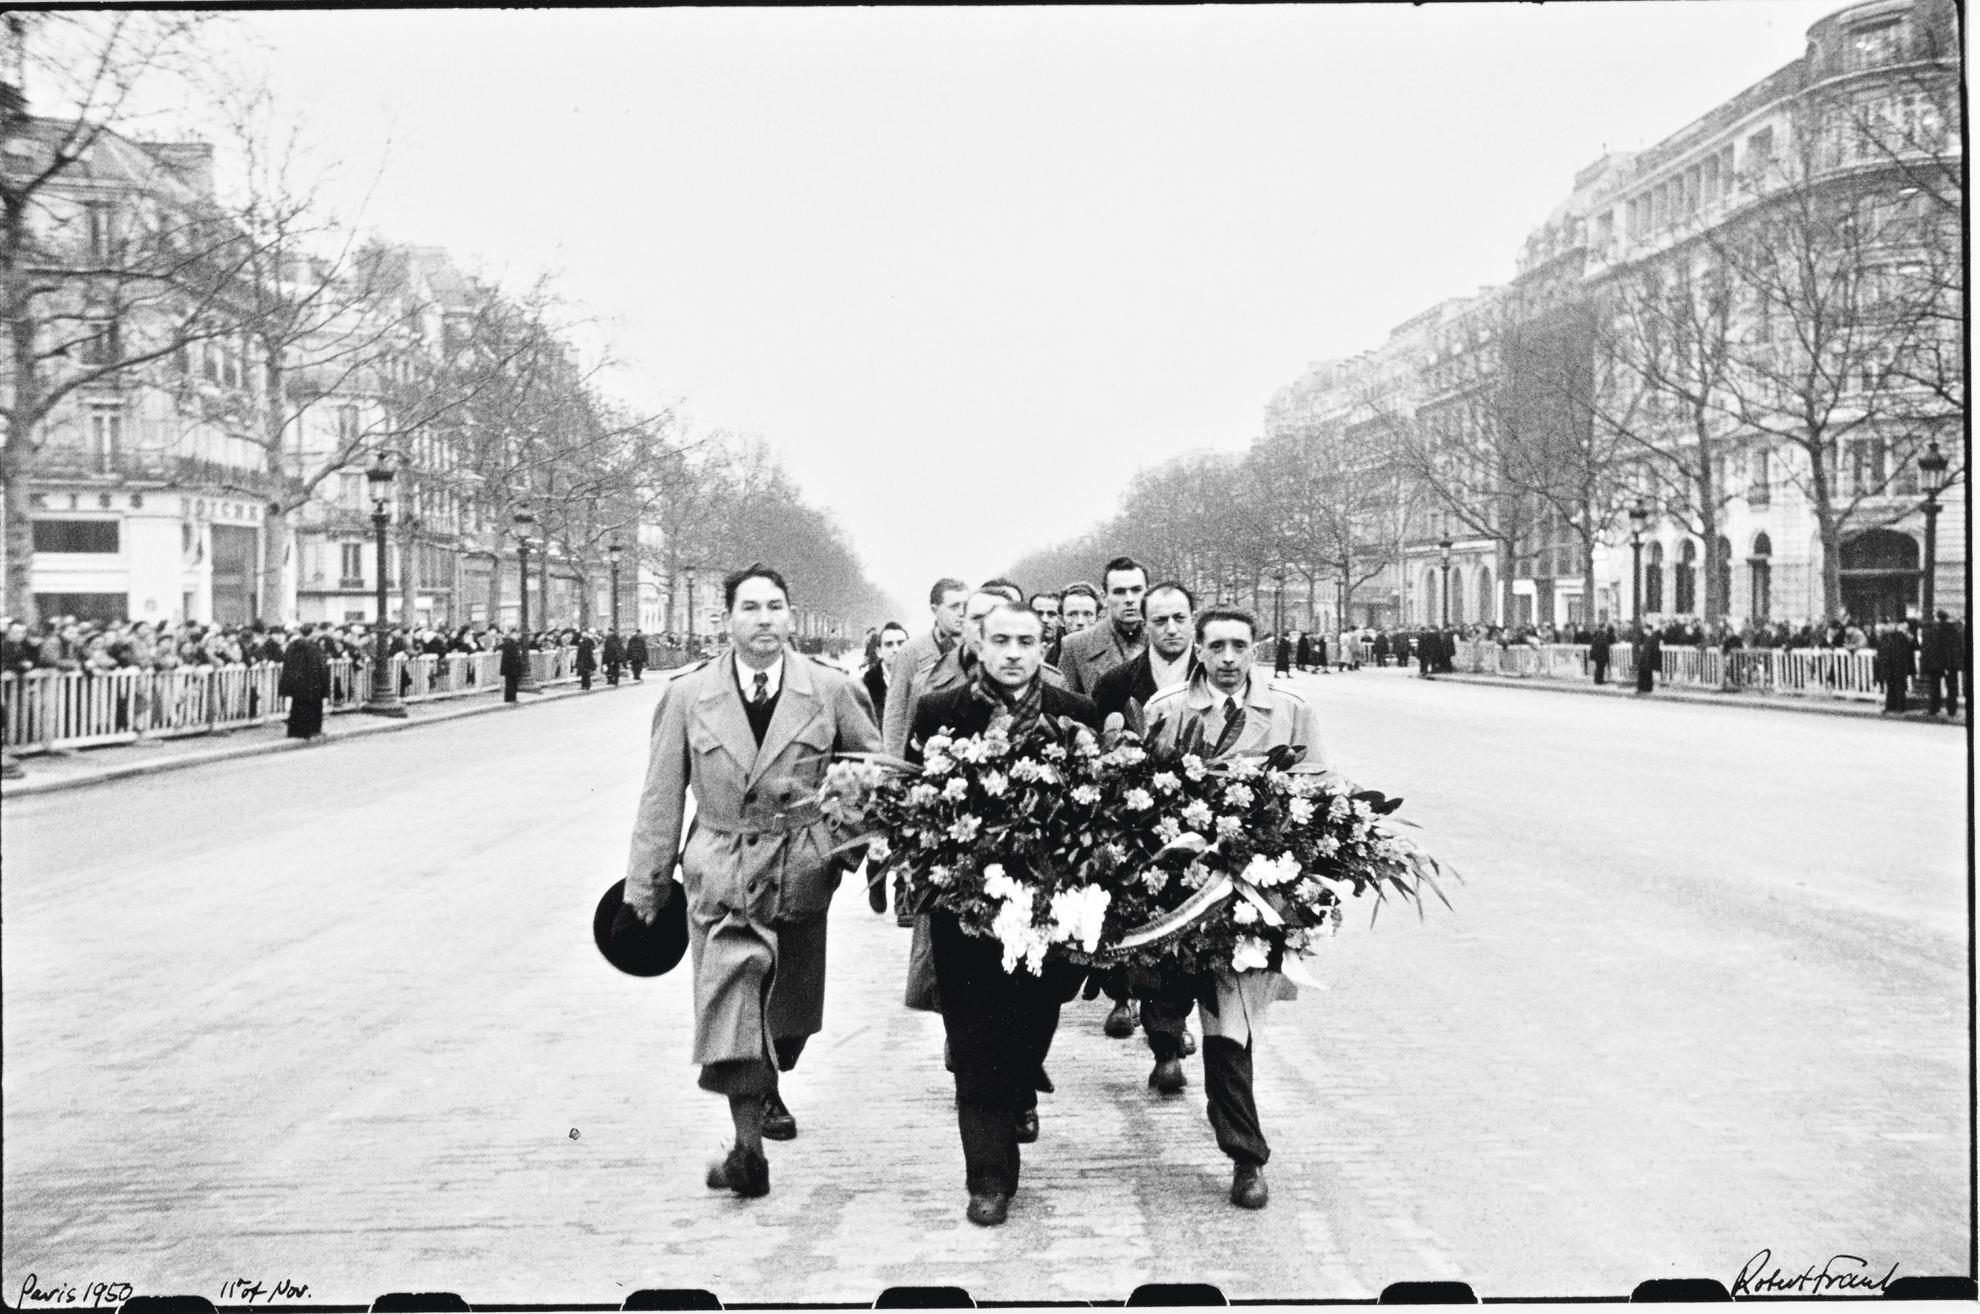 Robert Frank-11Th Of Nov. (Champs-Elysees, November 11Th, Paris)-1950